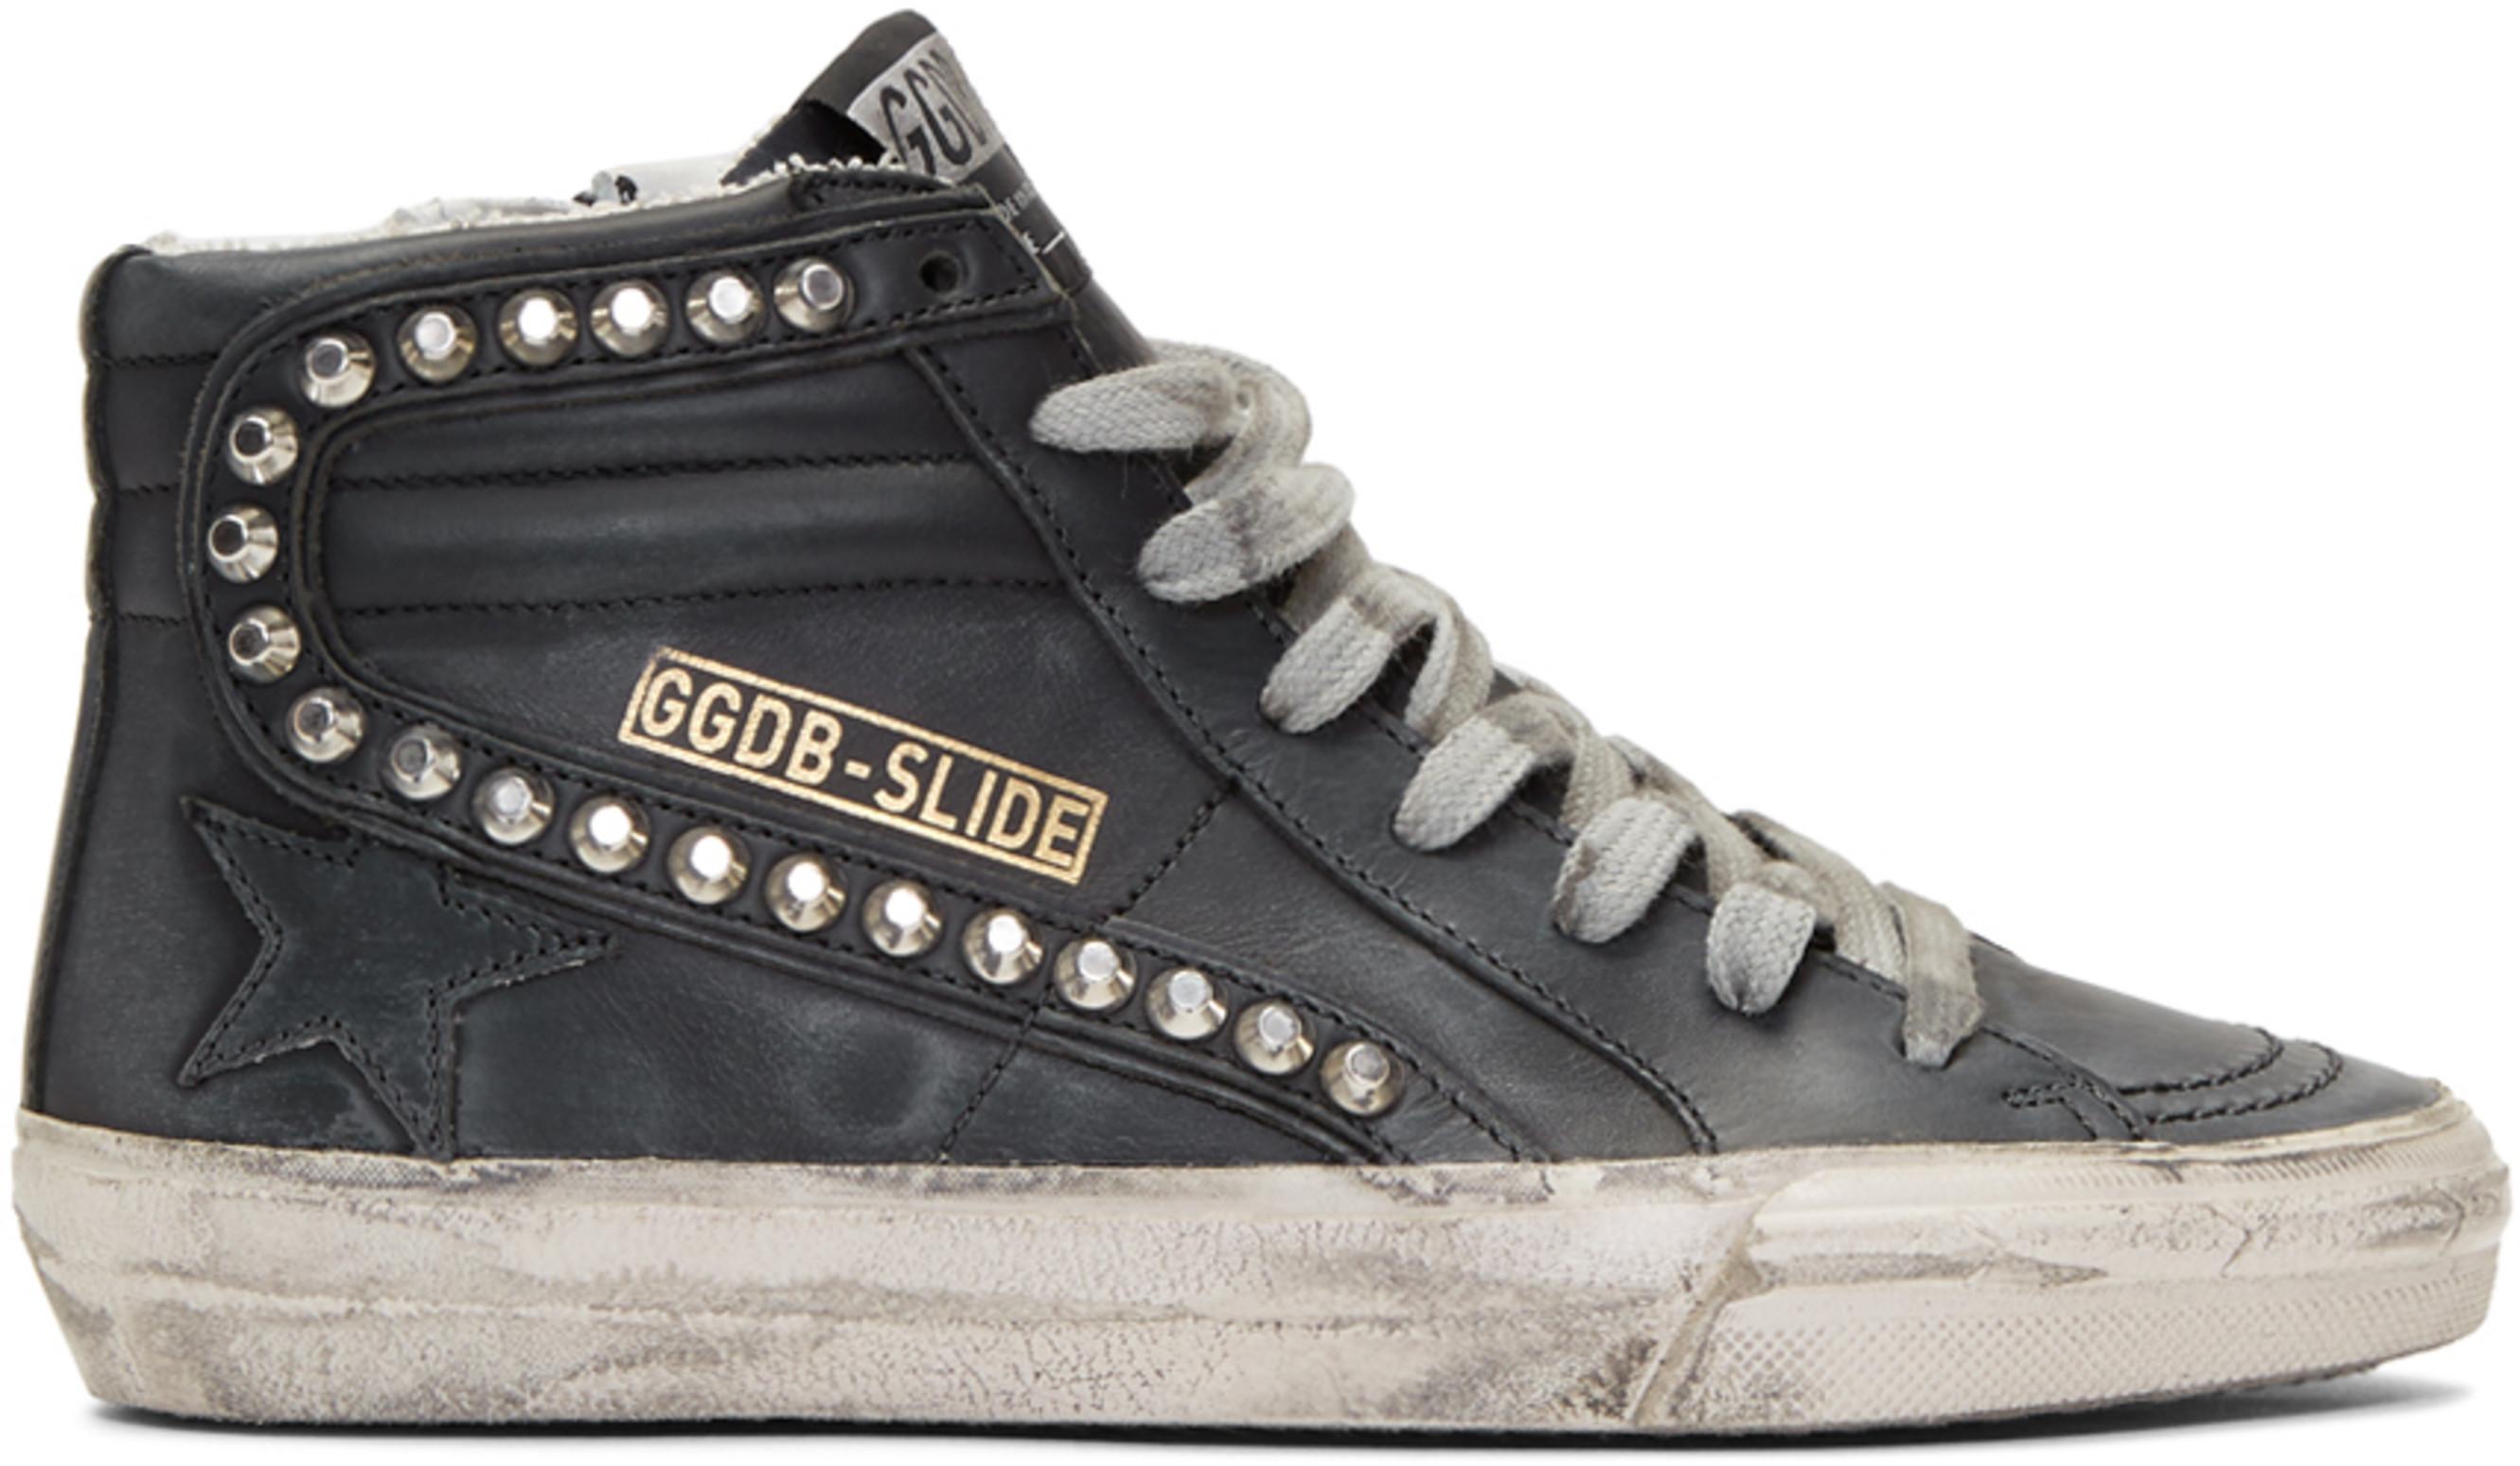 a708db99ebd64 Golden Goose shoes for Women